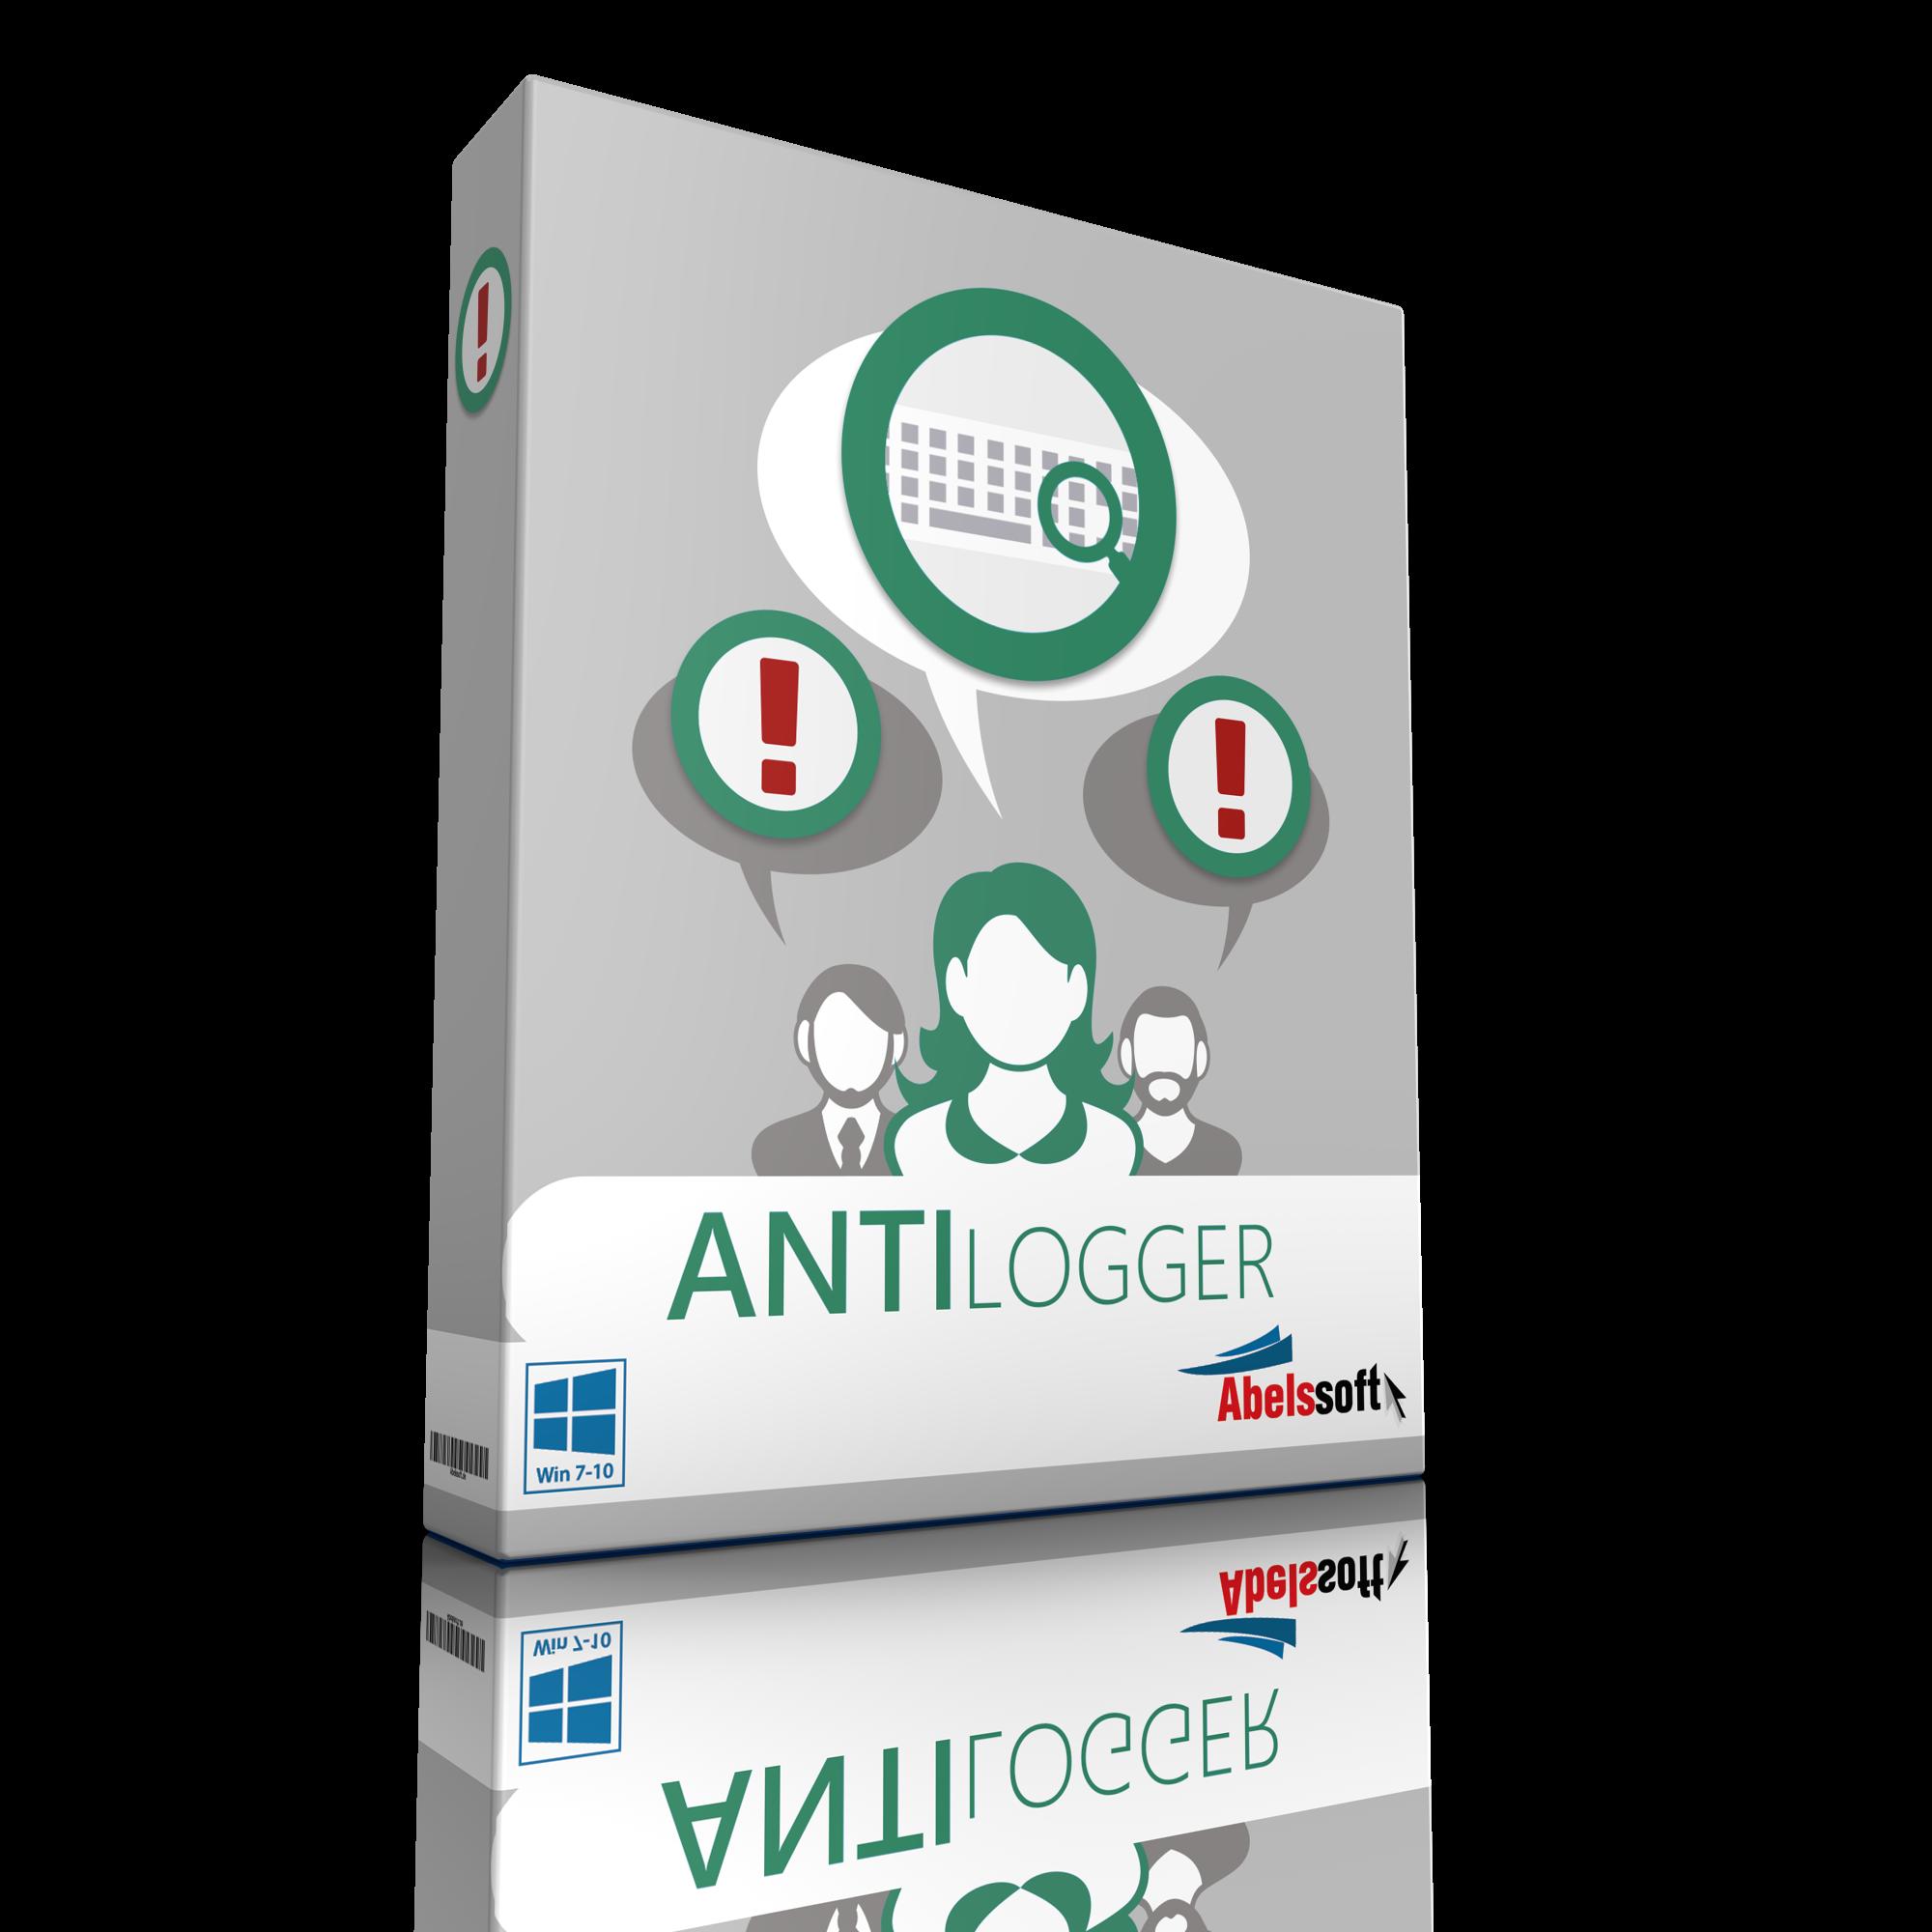 APC full-version software downloads m8dzgLG82eQWkY3dgc7G